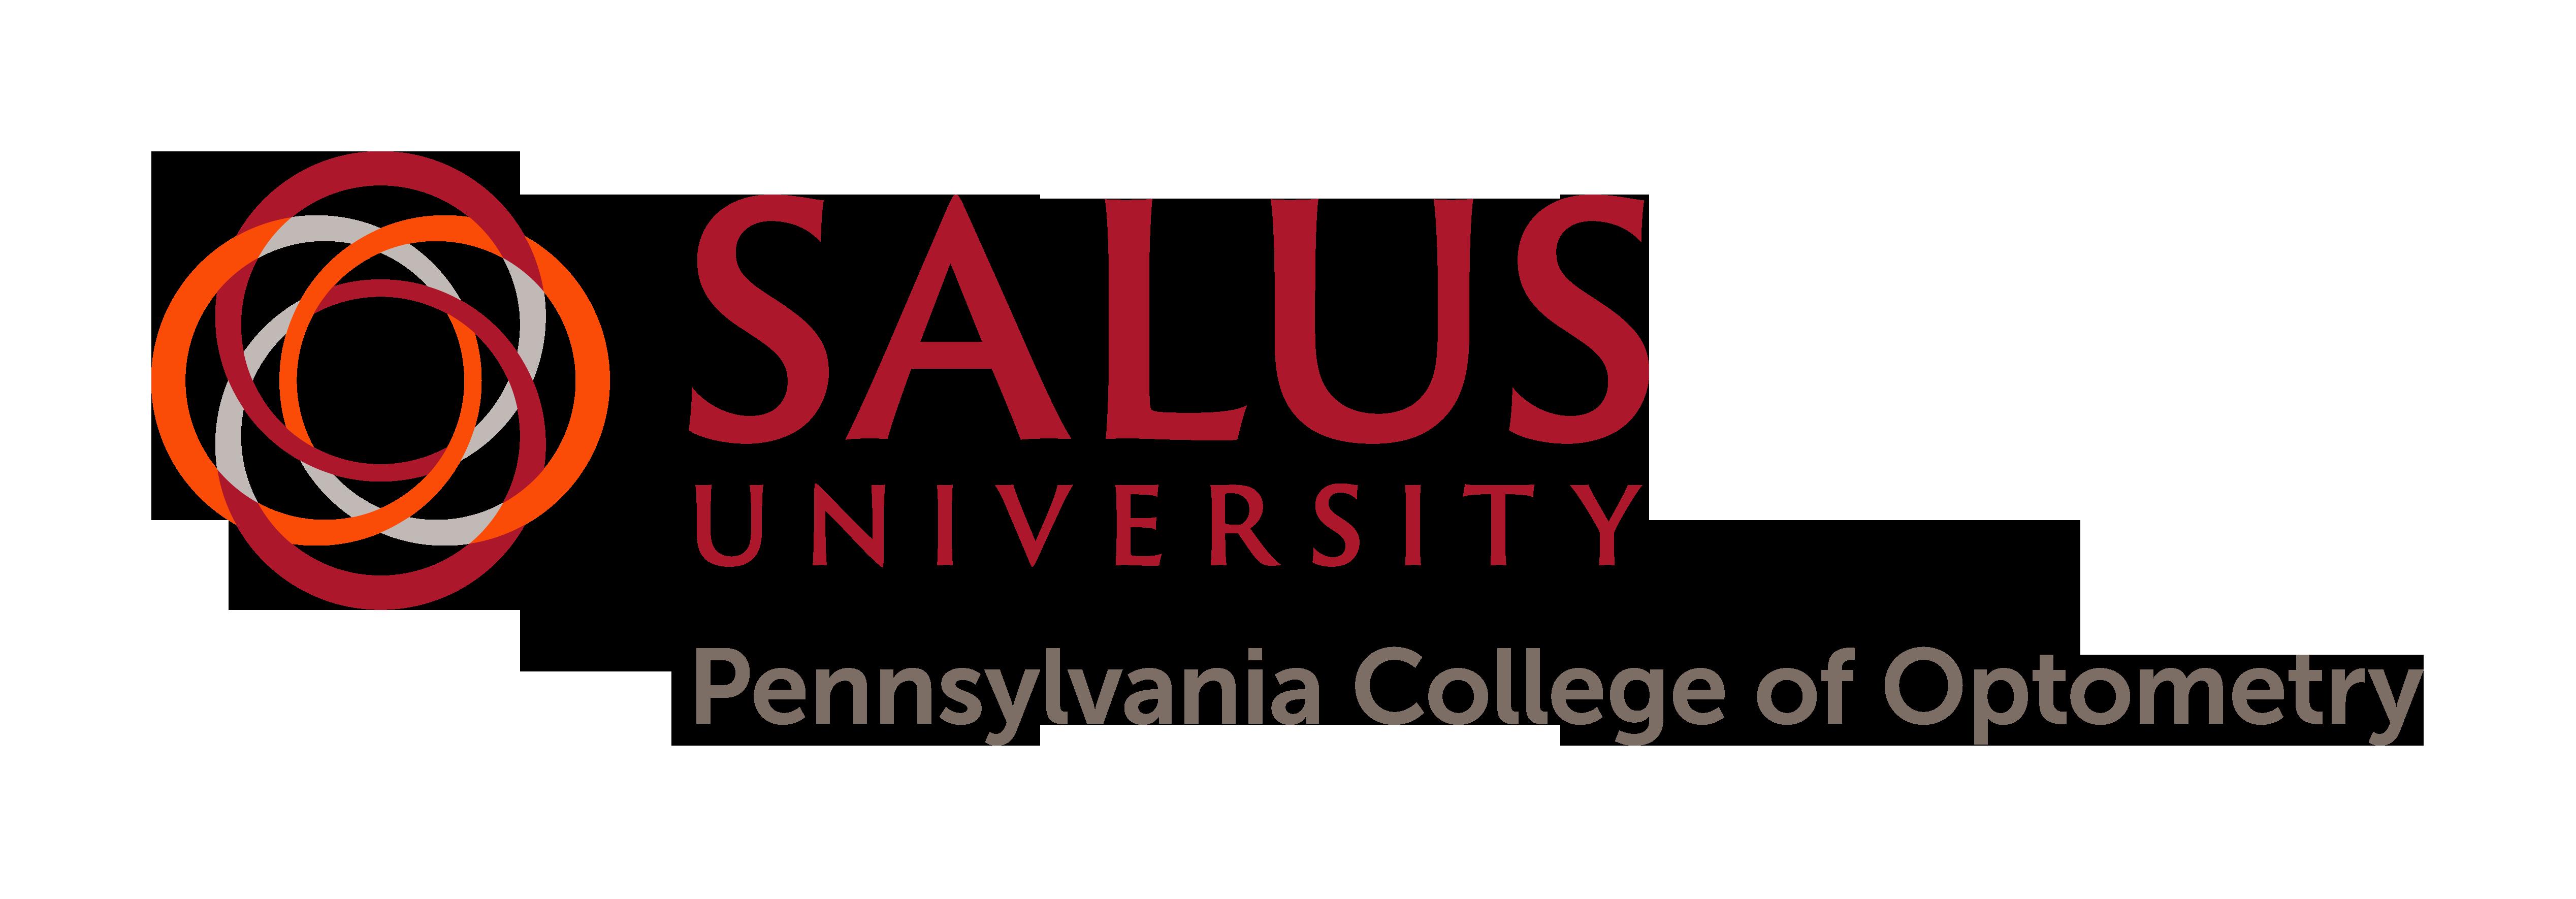 SalusUniv-Logo_PennsylvaniaCollegeofOptometry